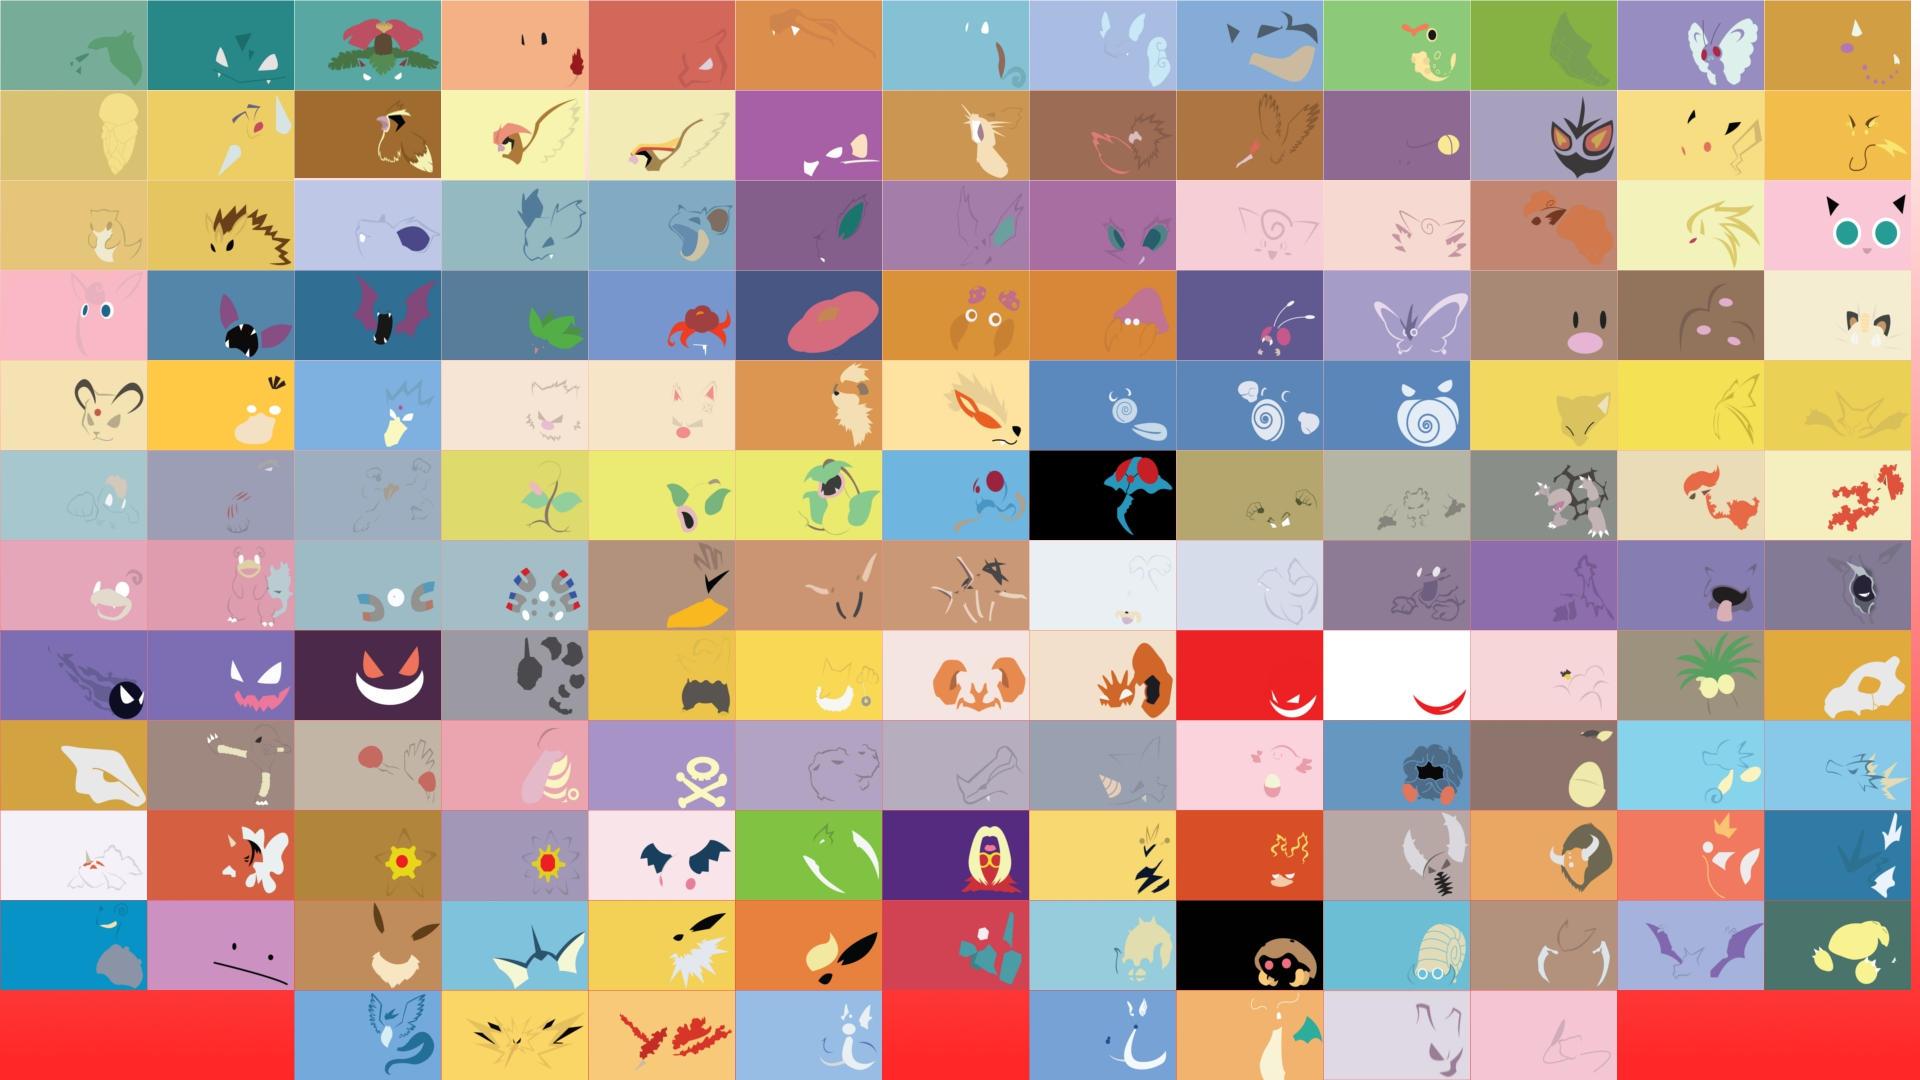 pokemon wallpapersredsoxrock01 on deviantart